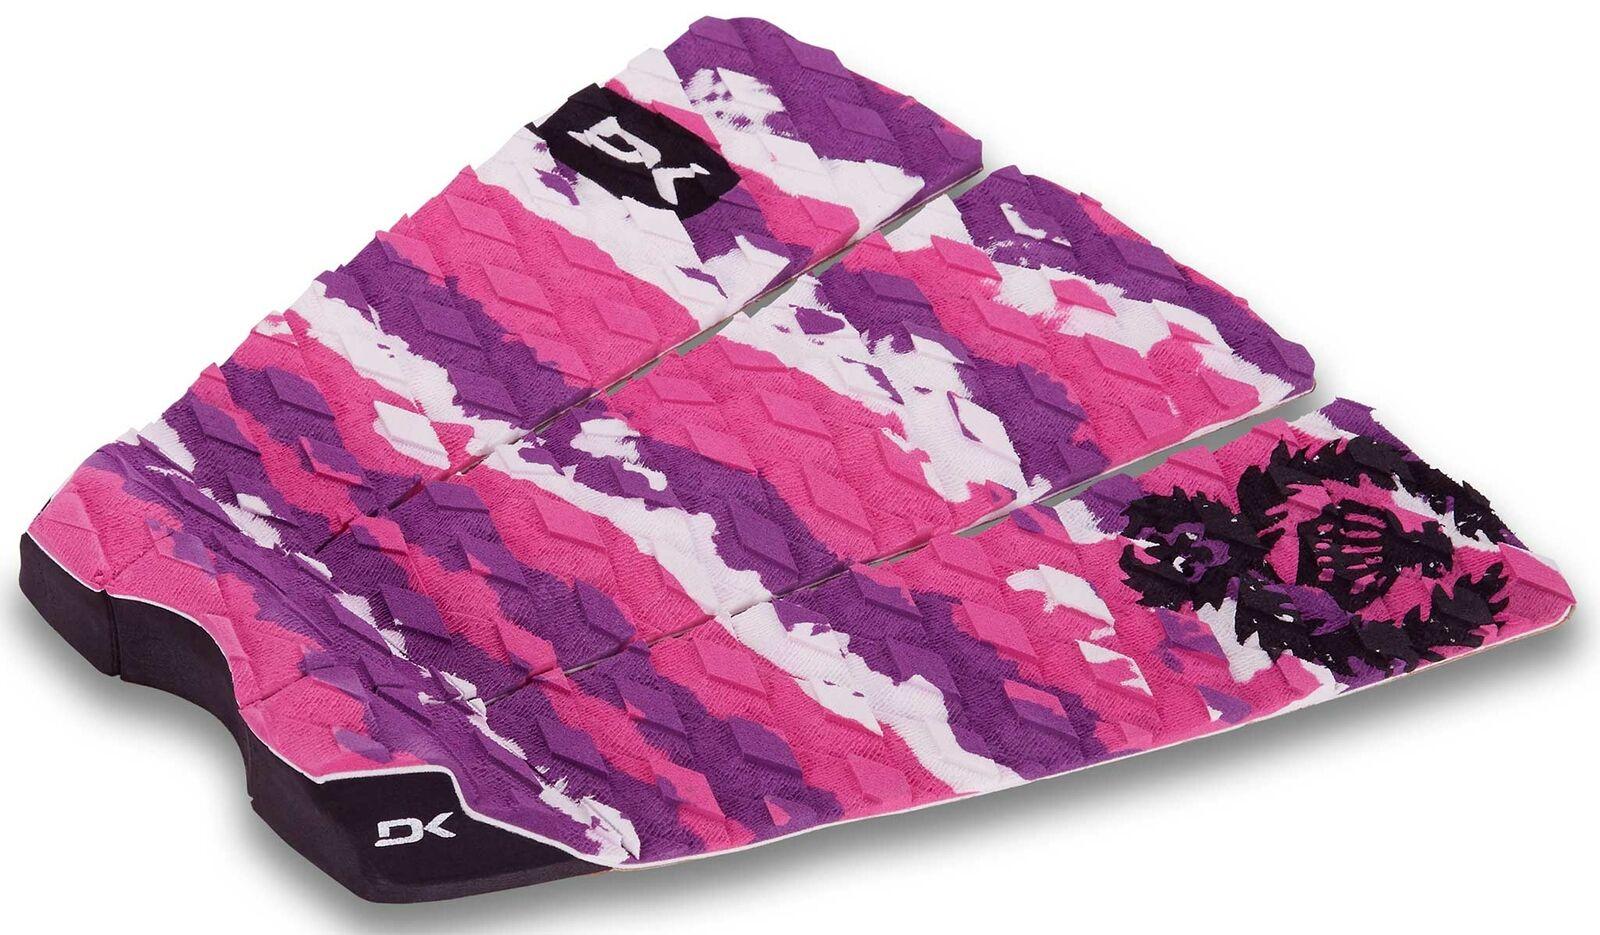 DaKine Carissa Moore Pro Model Traction Pad - Pink - New